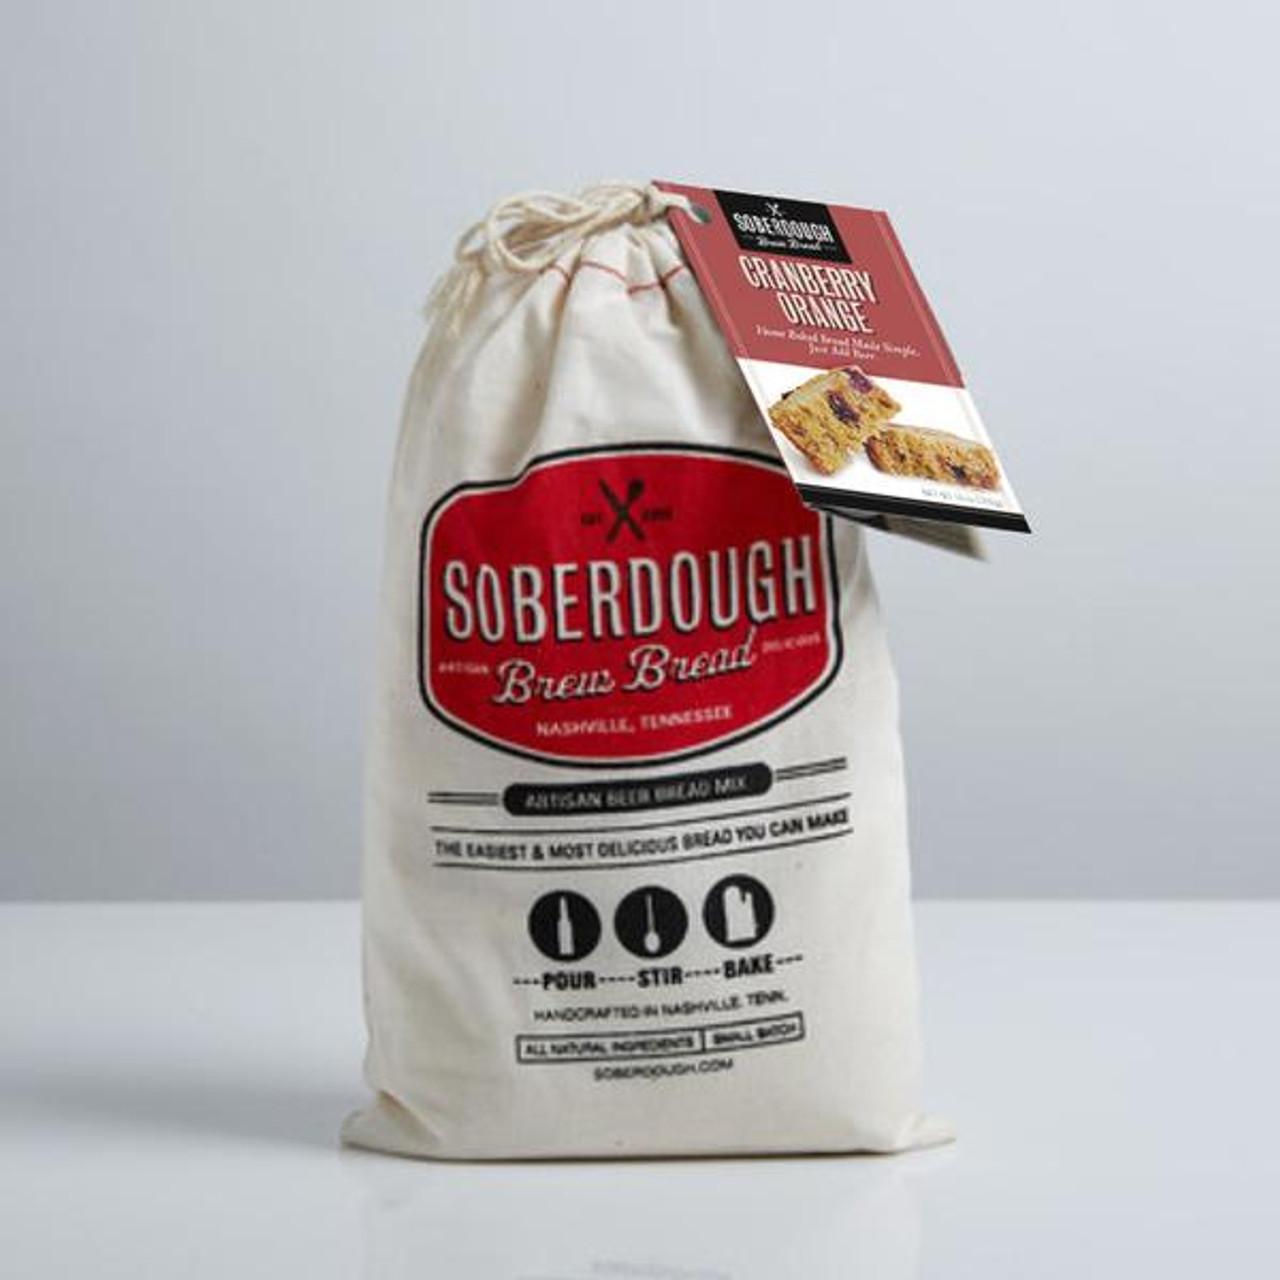 Soberdough cranberry and orange beer bread